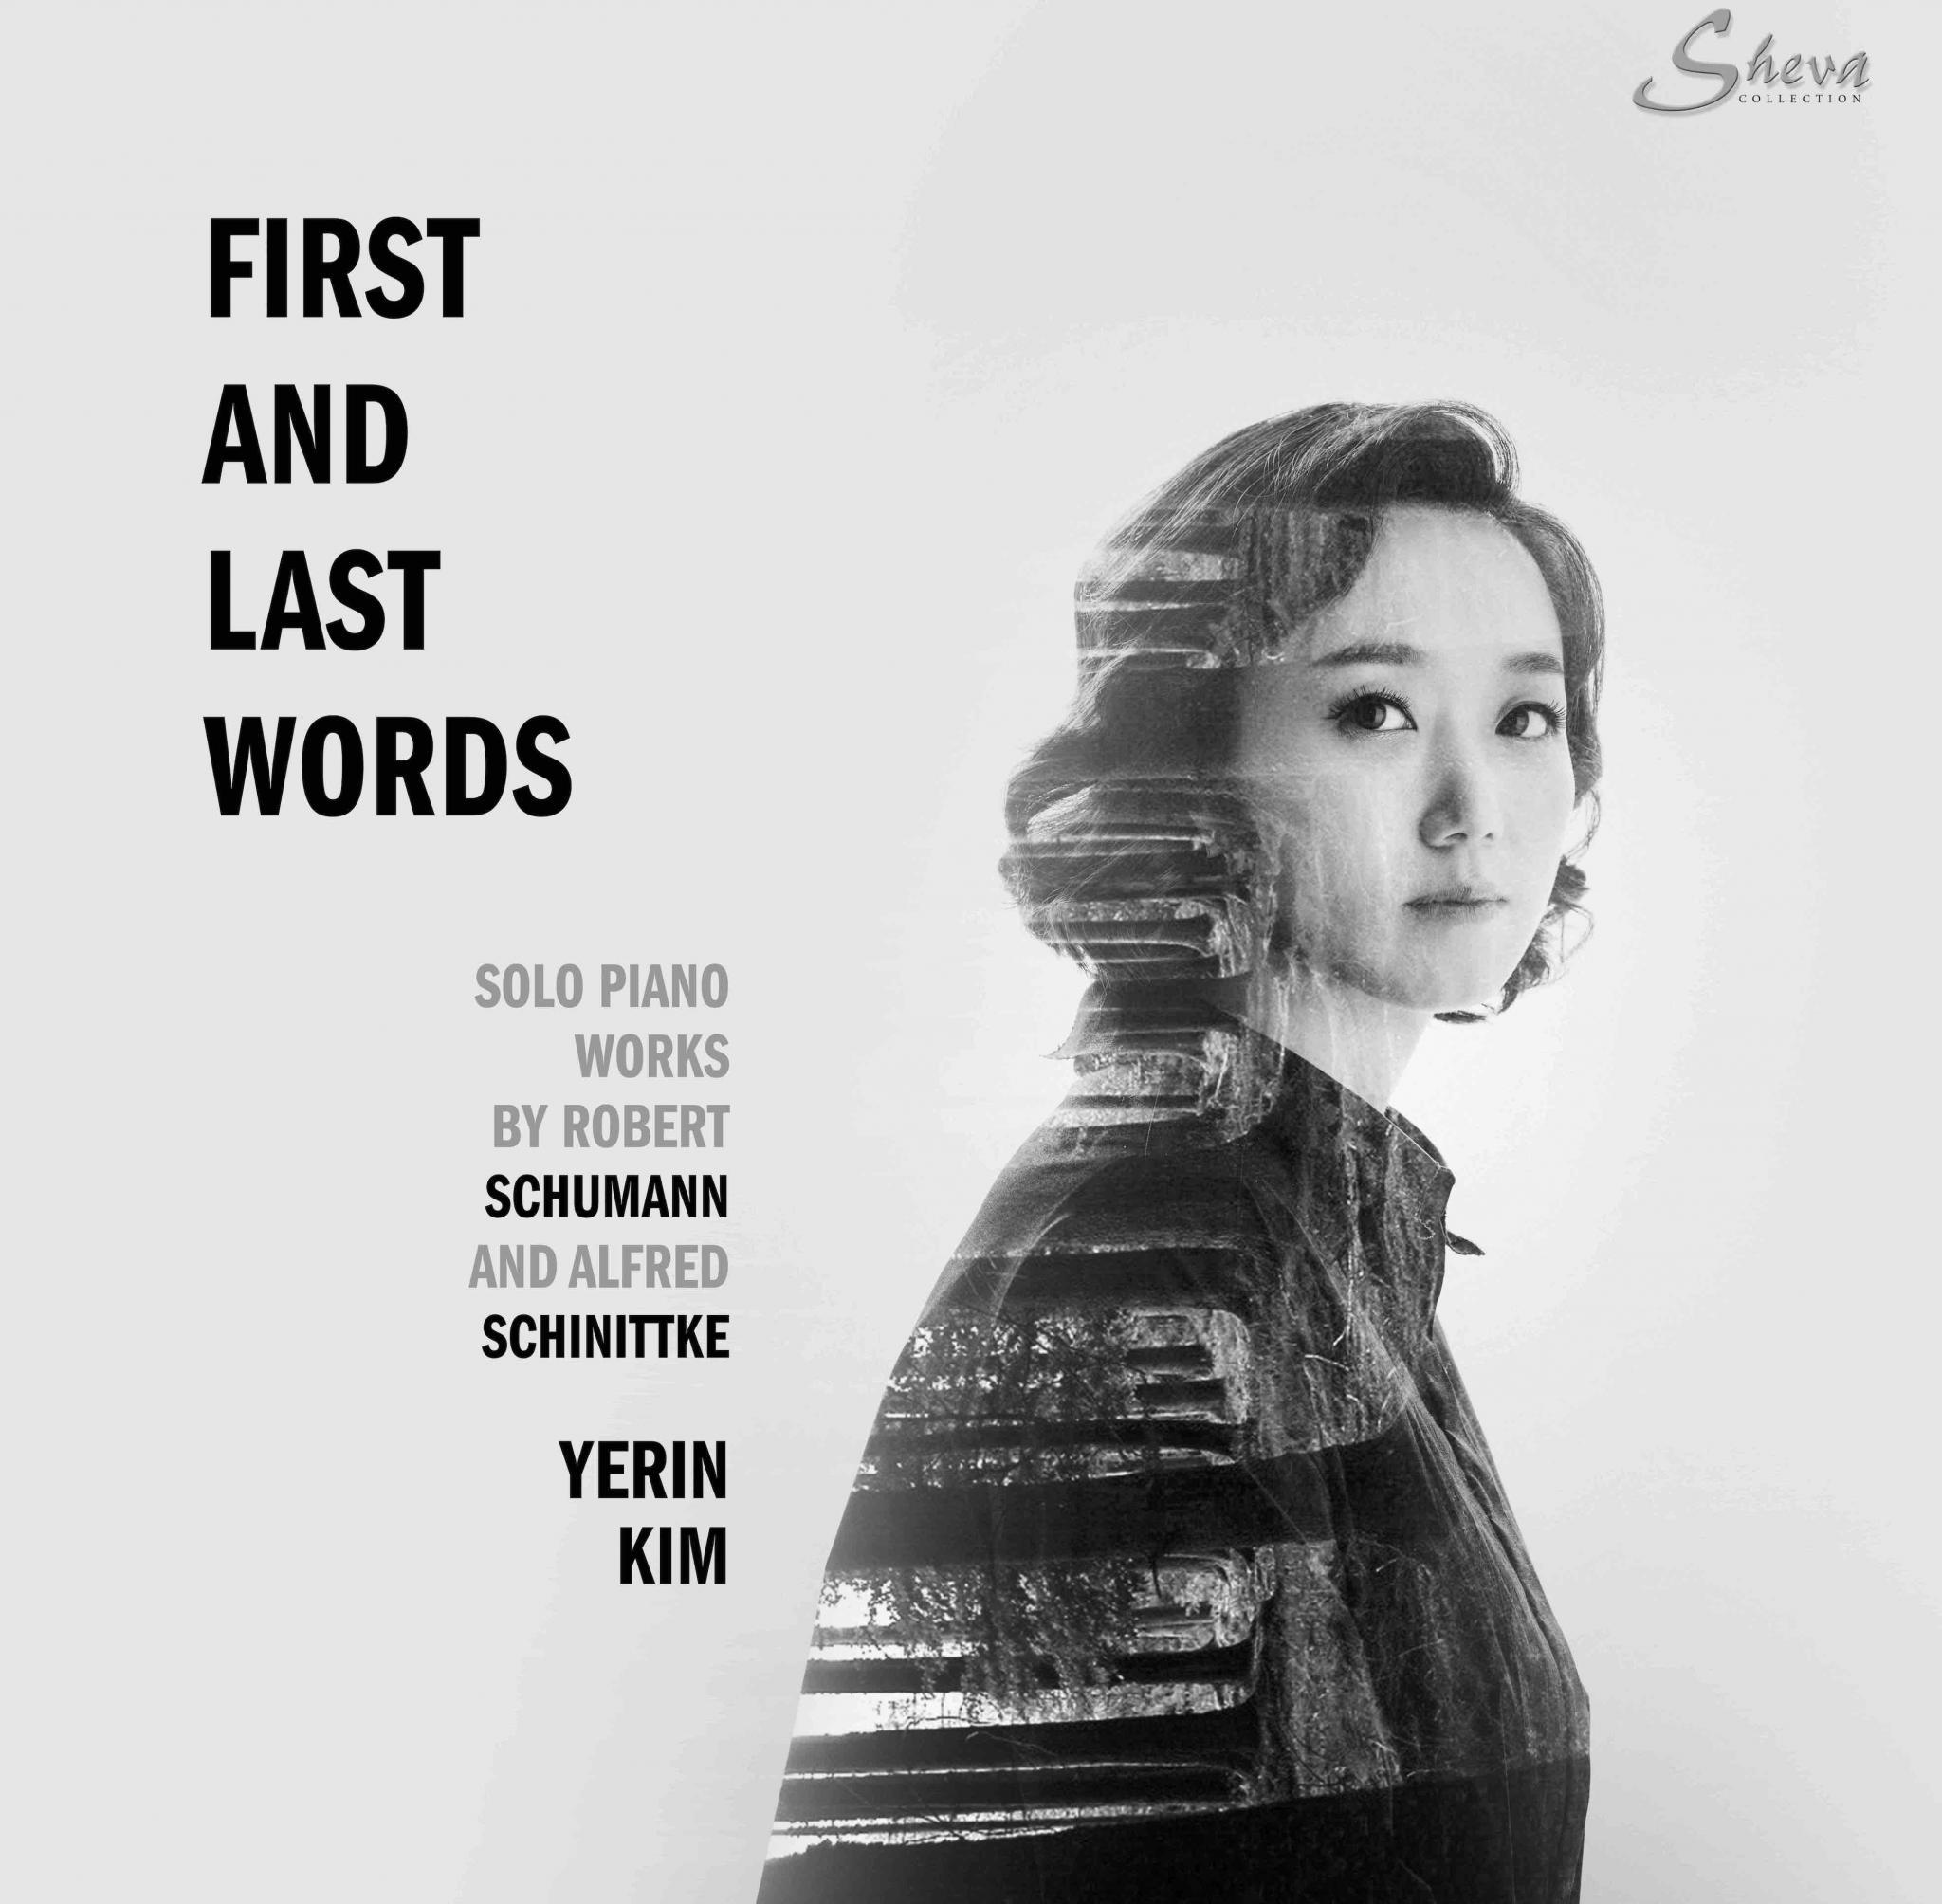 SHEVA 217 FIRST AND LAST WORDS - Yerin Kim, piano